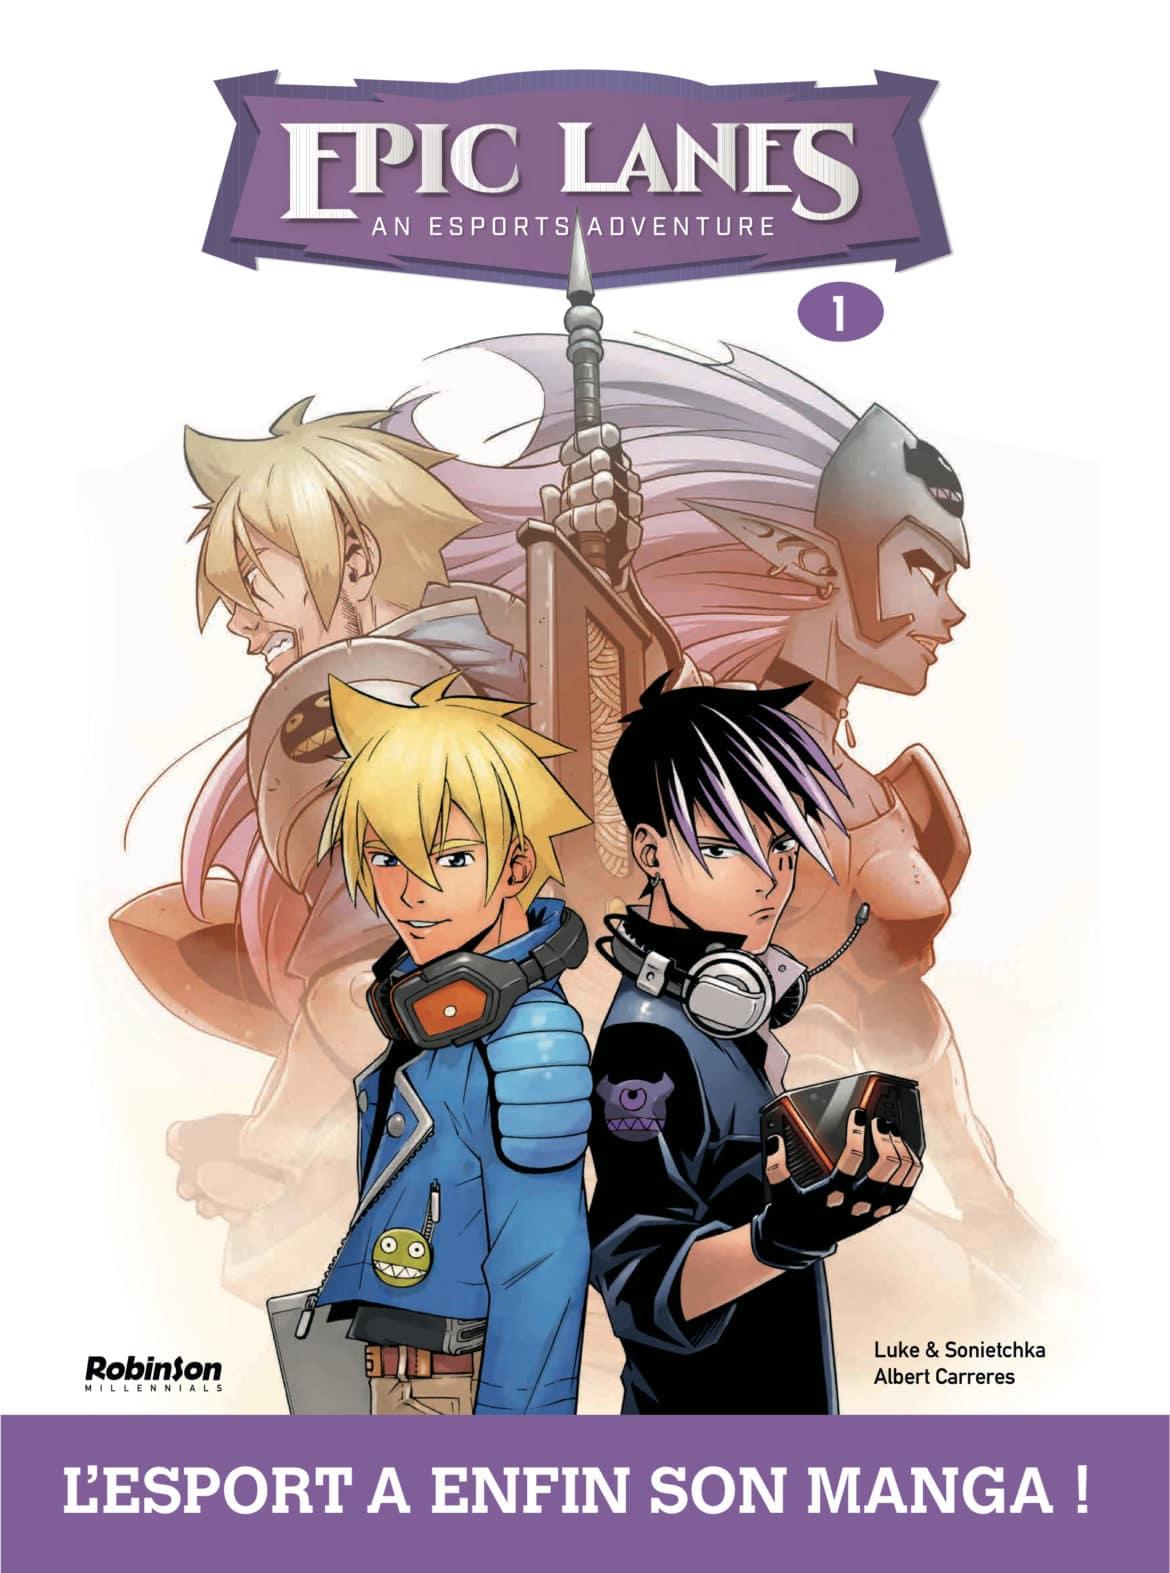 epic-lanes-web-esport-manga